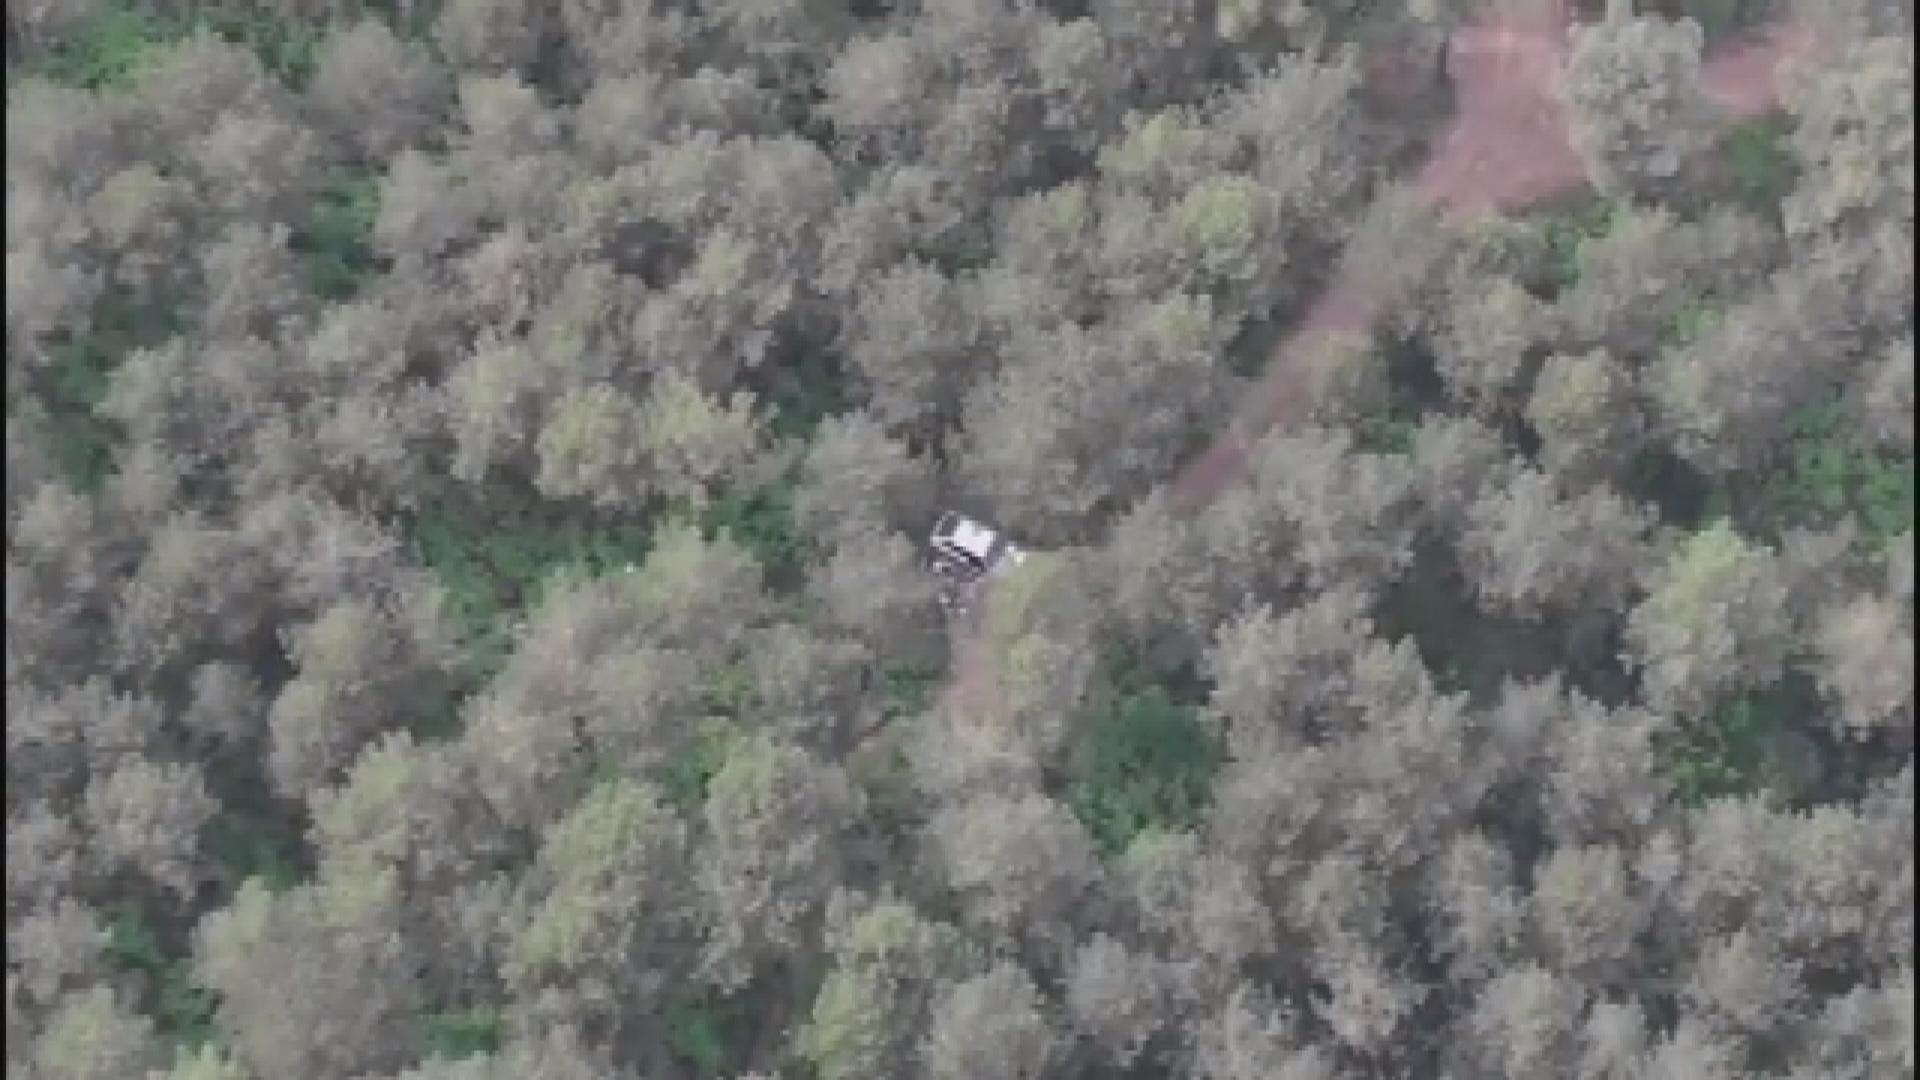 sultanbeylide-ormanda-piknik-yapan-2-kisi-drone-ile-tespit-edildi-1950-dhaphoto1.jpg